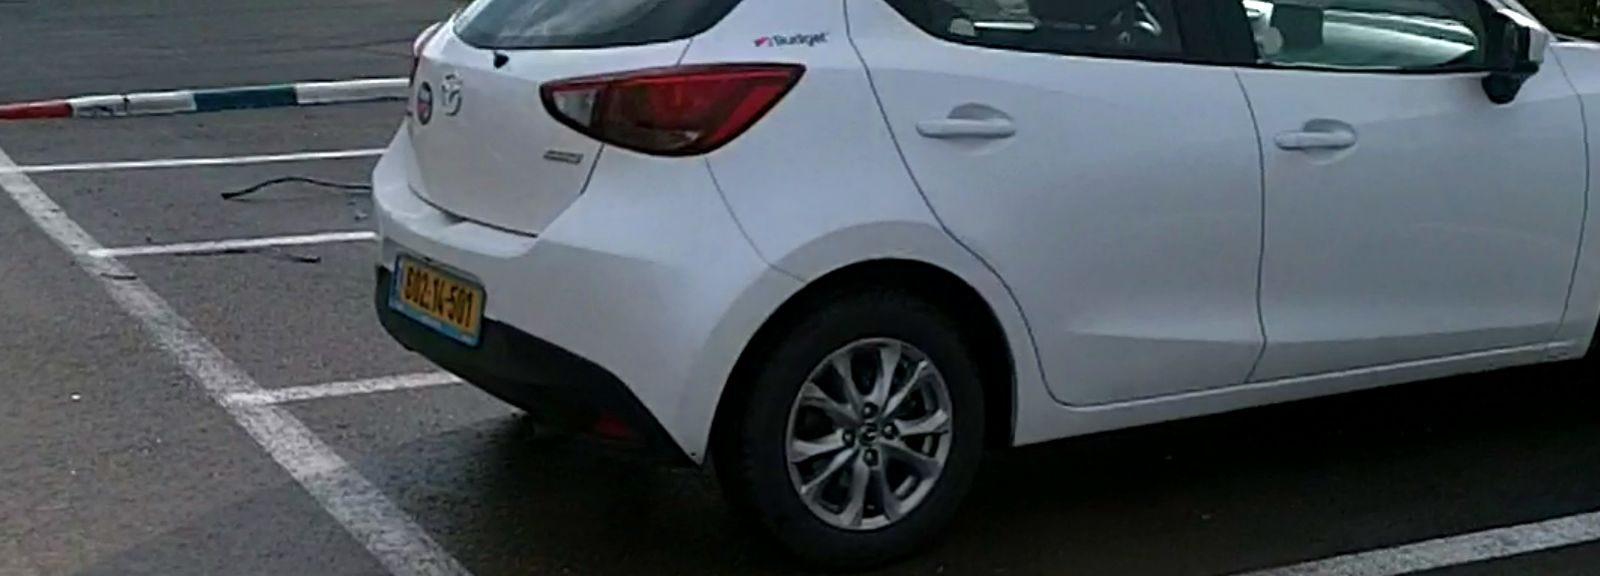 Autofahren in Israel